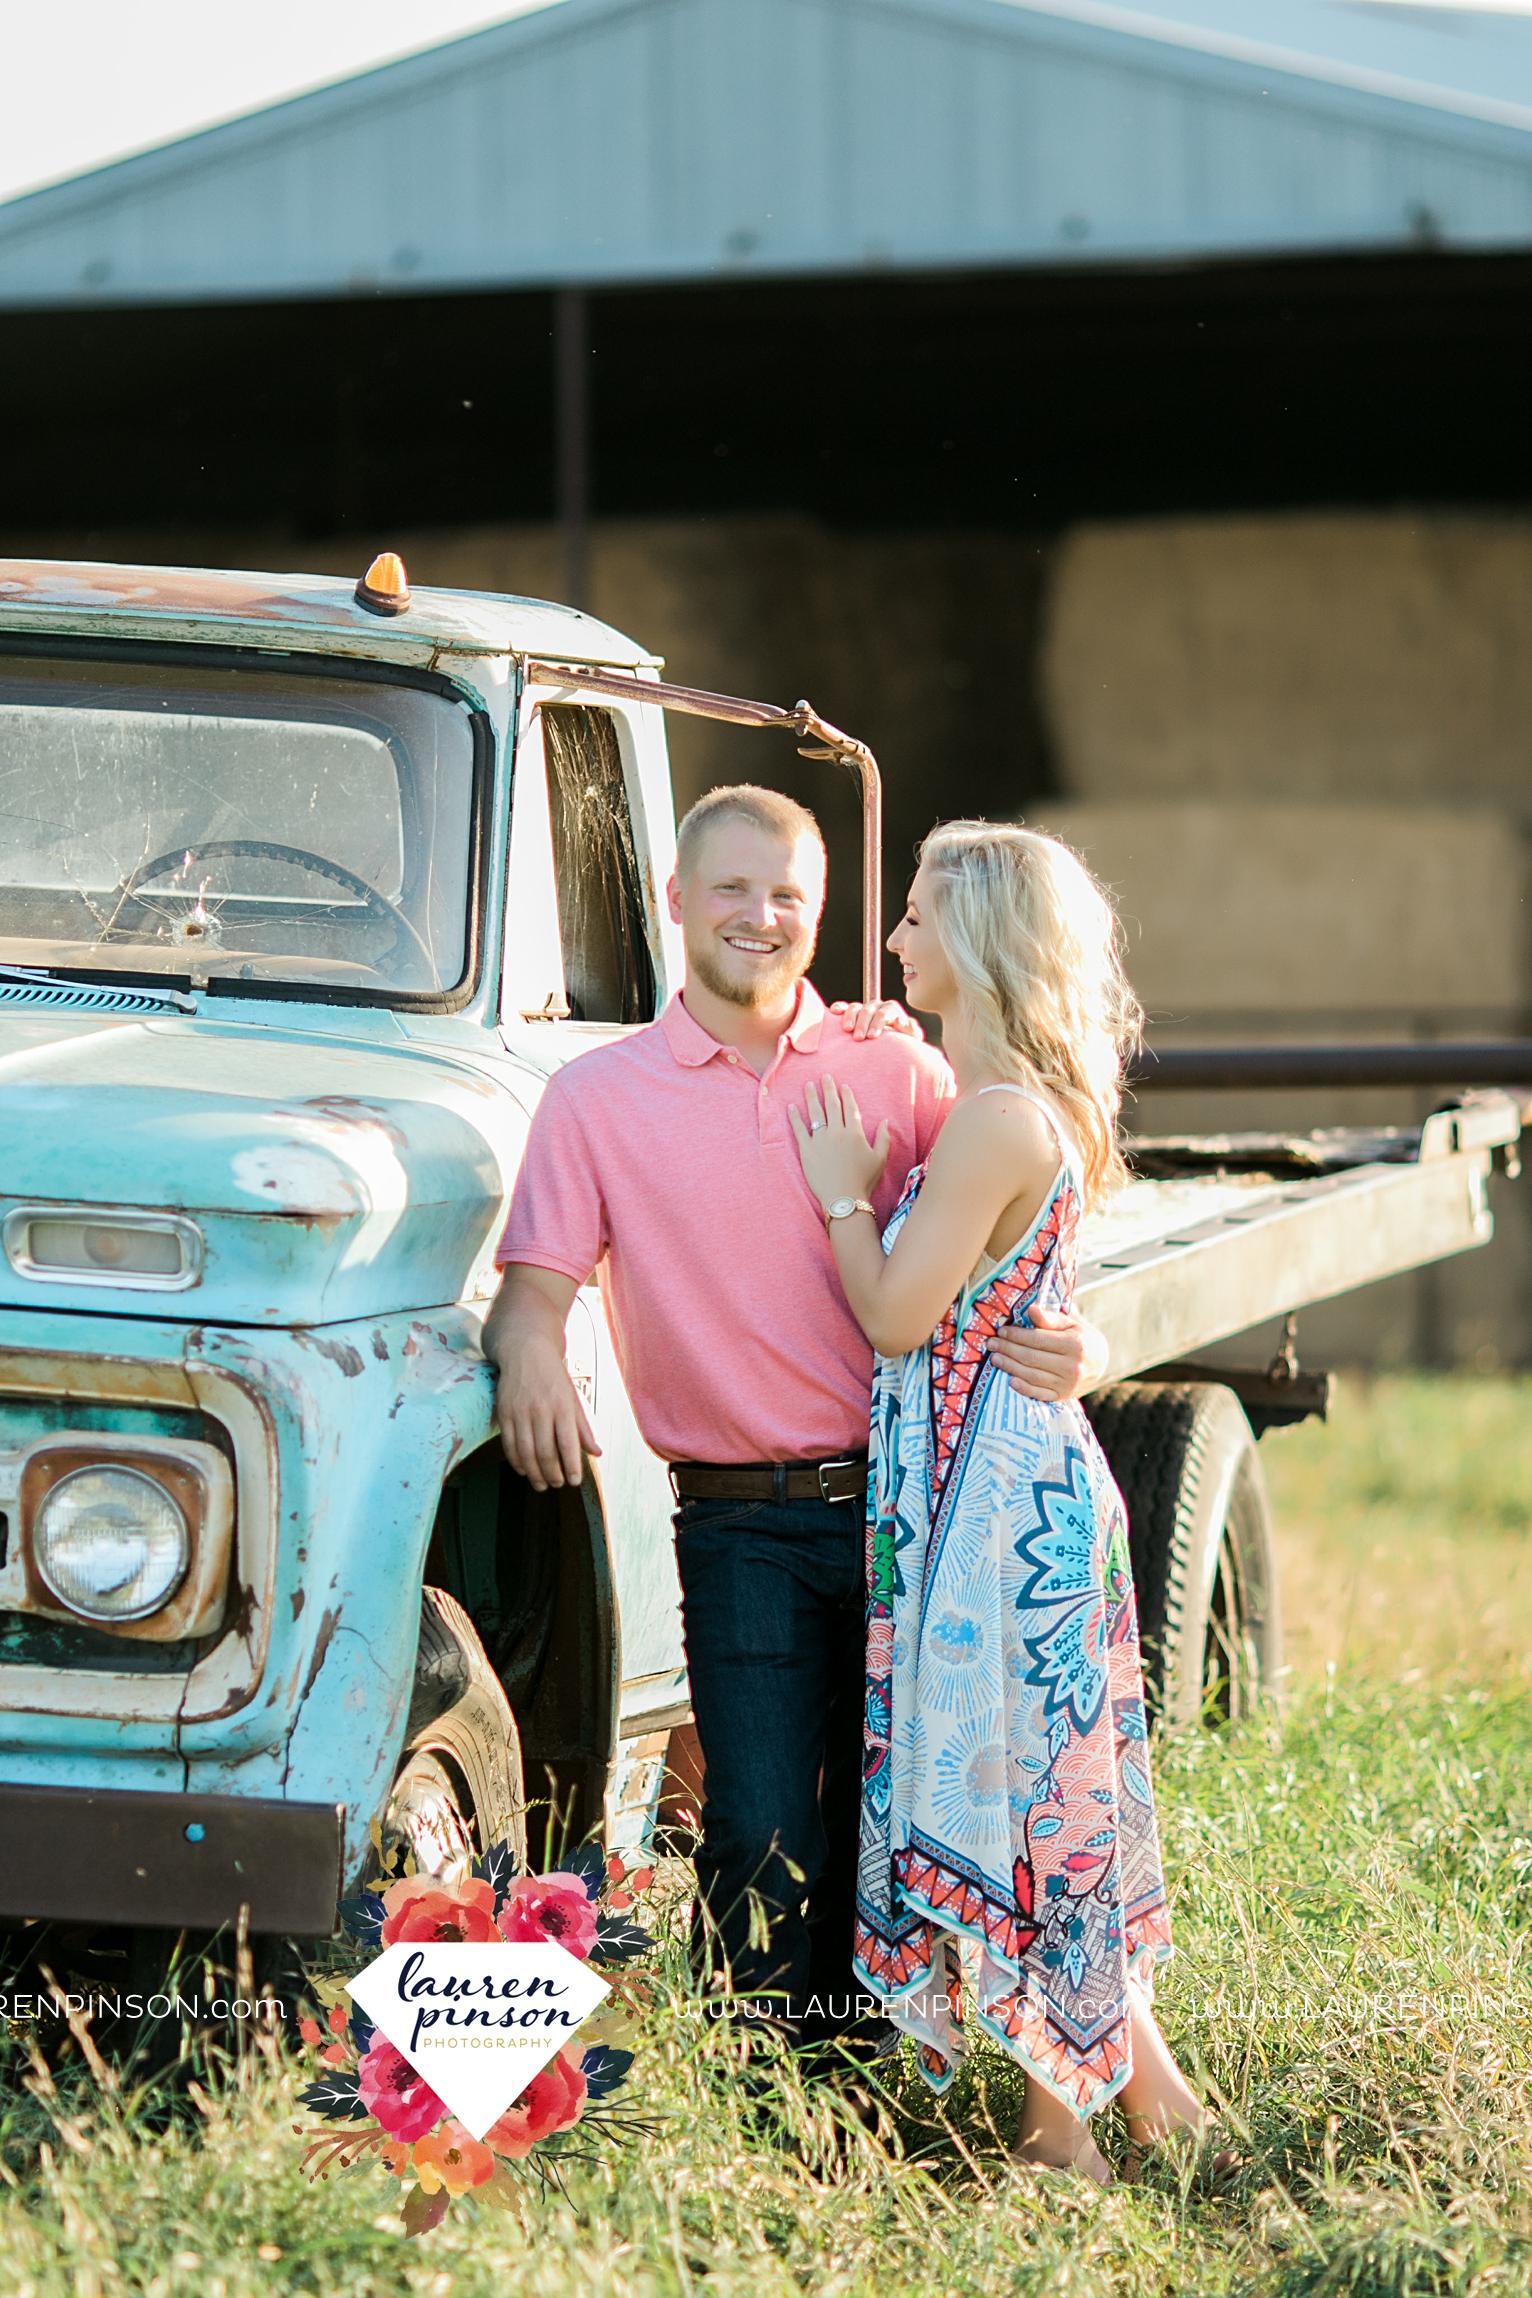 wichita-falls-texas-wedding-photographer-scotland-texas-engagement-session-country-barn-field-windthorst_2748.jpg